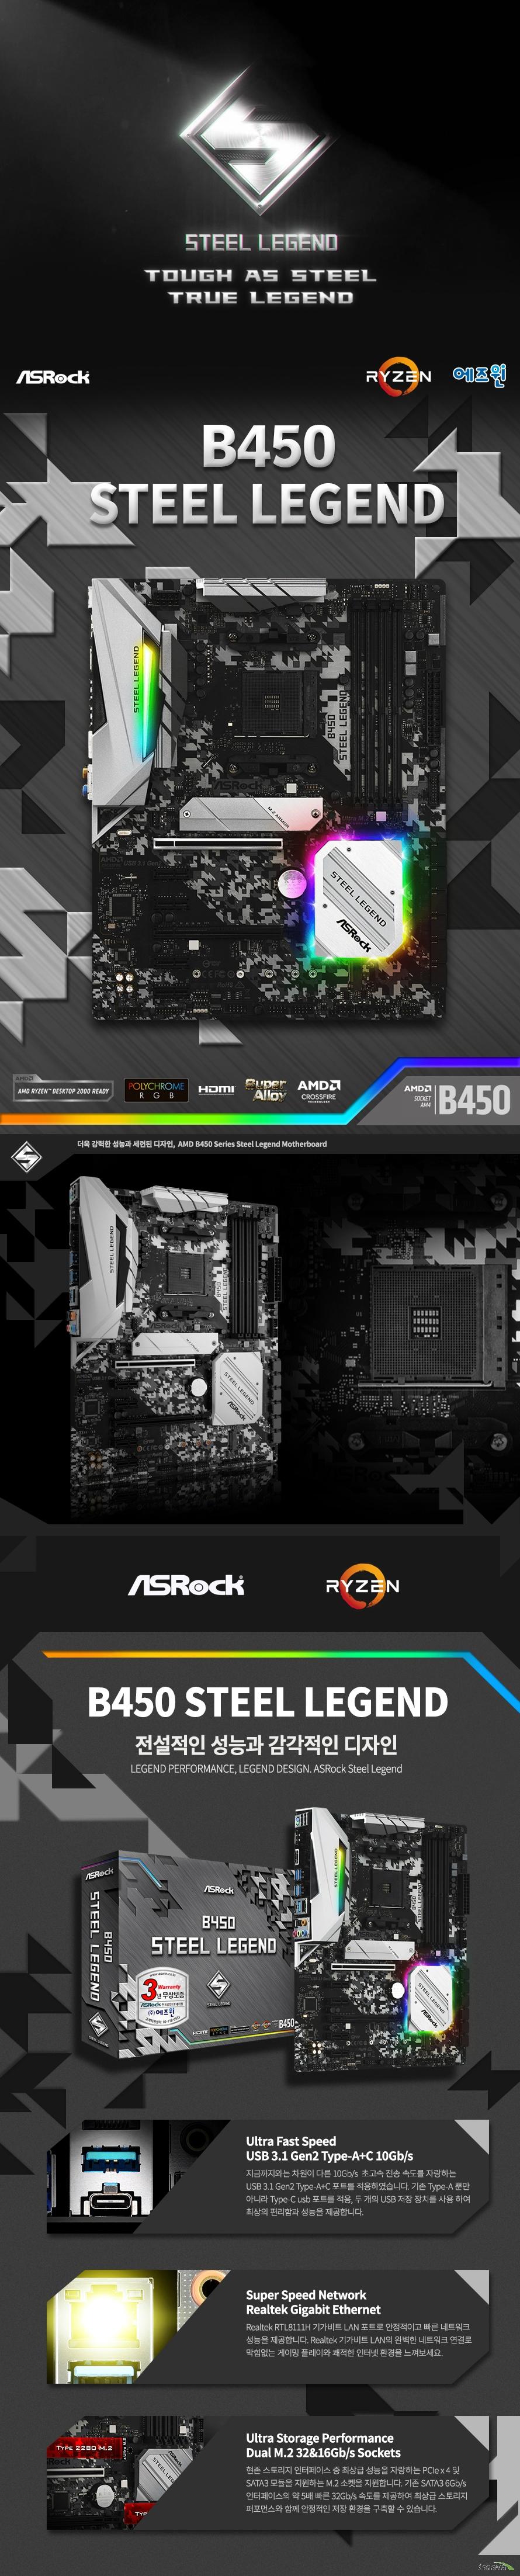 ASRock B450 스틸레전드 에즈윈  제품 상세 스펙  AMD am4 소켓 라이젠 서밋 릿지, 피나클릿지 및 레이븐 릿지 CPU 지원  6파워 페이즈 디자인 수냉 쿨링 피나클릿지 최대 105와트, 서밋릿지 최대 95와트 및 레이븐 릿지 최대 65와트 지원  Amd b450칩셋 적용  듀얼채널 ddr4 메모리 최대 64기가바이트 지원  Amd 라이젠 피나클릿지 cpu  Ddr4 3533+ 3200 2933 2667 2400 2133 ecc 및 non ecc un buffered memory 지원  Amd 라이젠 서밋릿지 cpu  Ddr4 3466+ 3200 2933 2667 2400 2133 ecc 및 non ecc un buffered memory 지원  Amd 라이젠 레이븐릿지 cpu  Ddr4 3200+ 2933 2667 2400 2133 ecc 및 non ecc un buffered memory 지원 레이븐 릿지 pro 시리즈 cpu에서만 ecc메모리를 지원합니다.  32비트 운영체제환경에서는 실제 메모리 사이즈가 4기가바이트 이하로 인식될 수 있습니다.  확장 슬롯  Amd 라이젠 서밋릿지 및 피나클릿지 cpu Pcie 3.0 16배속 슬롯 2개 지원  Pcie1 슬롯에서 싱글 사용시 16배속 동작 Pcie4 슬롯에서 싱글 사용시 4배속 동작  Amd 라이젠 레이븐 릿지 cpu Pcie 3.0 16배속 슬롯 2개 지원  Pcie1 슬롯에서 싱글 사용시 8배속 동작 Pcie4 슬롯에서 싱글 사용시 4배속 동작  Pcie 2.0 1배속 슬롯 4개 지원  Amd 쿼드 크로스파이어 및 크로스 파이어 지원  Sata3 소켓 4개 지원 (raid 0 1 10 및 ncq AHCI및 HOT PLUG Sata3 소켓 2개 지원 asm1061 적용 및 ncq AHCI및 HOT PLUG  울트라 M.2 소켓 1개 지원 2242 2260 2280 규격 및 PCIE GEN3 4배속 최대 32기가바이트 지원 NVME SSD as boot disk 및 애즈락 u.2 kit 지원 M2_1 소켓을 사용하면 pcie4 슬롯은 비활성화됩니다.  m.2 소켓 1개 지원 2230 2242 2260 2280 규격 및 SATA3및 PCIE GEN3 2배속 최대 16기가바이트 지원 M2_2 소켓과 sata3_3 sata3_4 포트는 대역폭을 공유하여 셋 중 하나를 사용하면 다른 포트는 비활성화 됩니다.  Usb 3,1 gen2 a+c 포트 지원 (후면 2개) Usb 3.1 gen1 포트 6개 지원 (후면 4개 전면 2개) Usb 2.0 포트 6개 지원 (후면 2개 전면 4개)  리얼텍 RTL8111H 기가비트 랜 지원  리얼텍 alc892 7.1채널 hd 오디오 코덱 지원  마이크로소프트 윈도우 10 64비트 운영체제 지원 ATX 폼팩터 크기 길이 30.5센티미터 넓이 24.4센티미터 KC 인증번호 R R ASR B450STEELLEG  제조사의 사정에 따라 사전고지 없이 일부 제품사양이 변경될 수 있으며 부품 호환 등 더 자세한 정보는 제조사 홈페이지 또는 제품 매뉴얼을 참고해주시기 바랍니다.